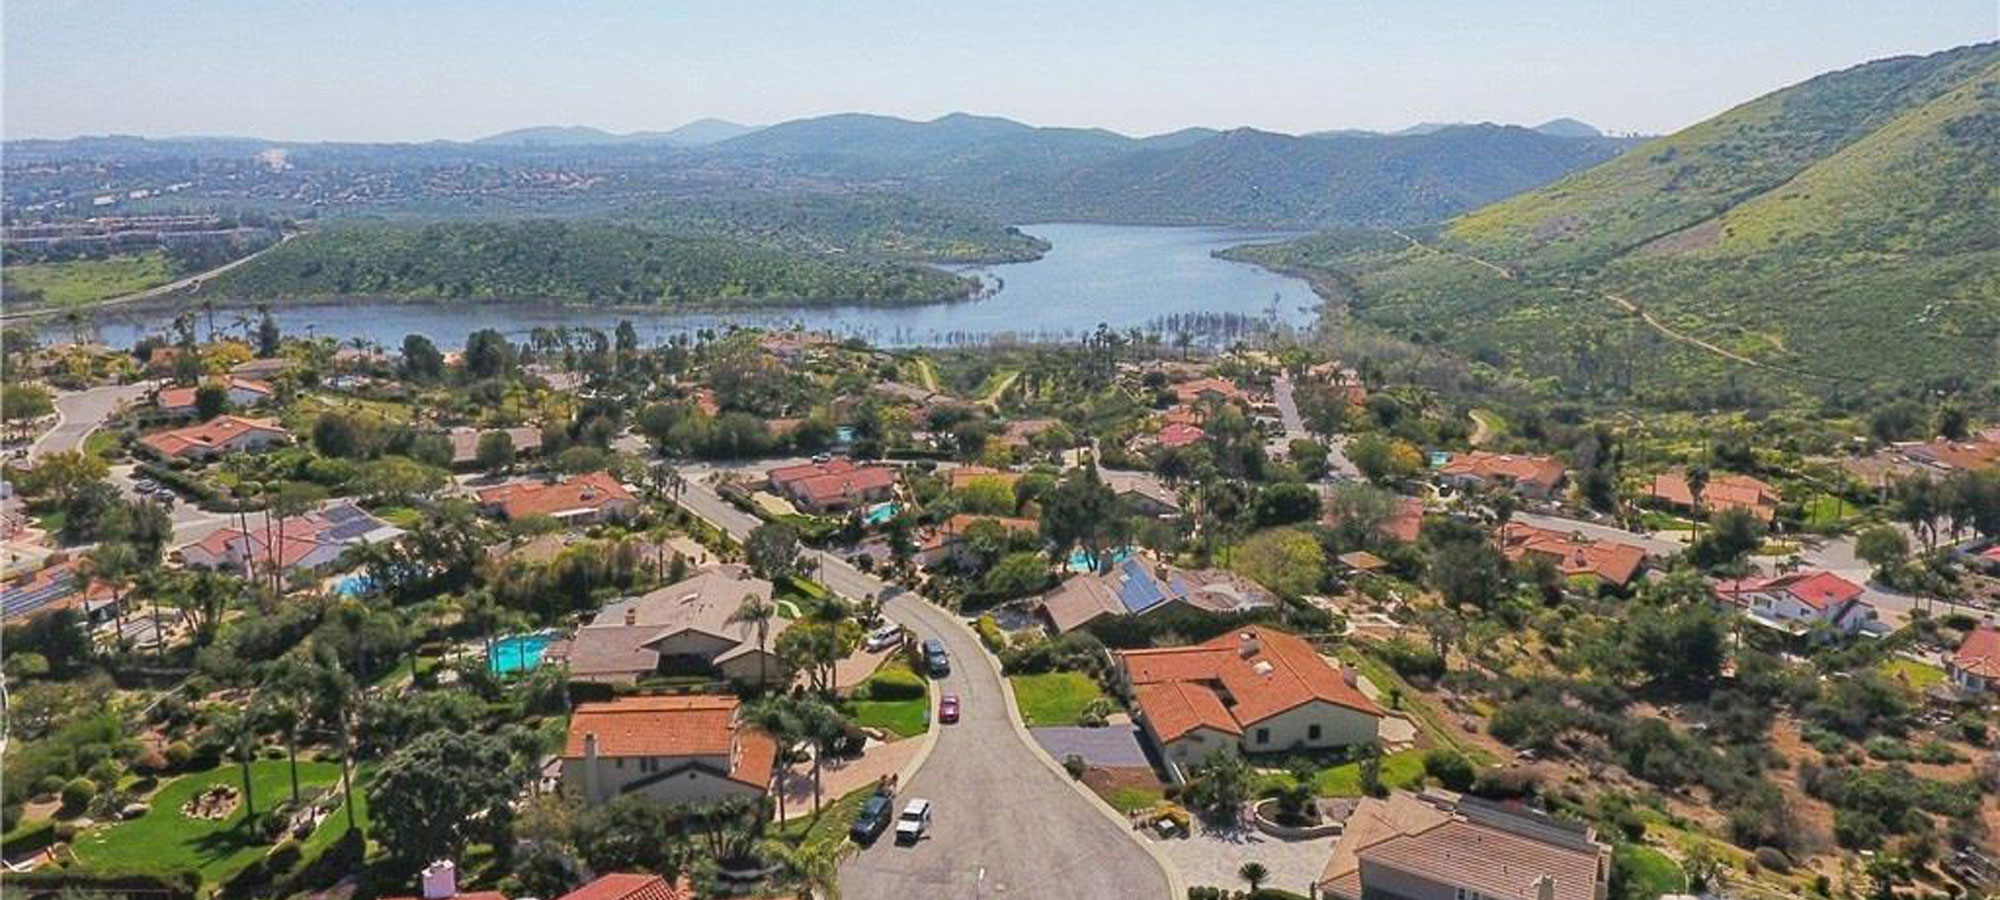 3551 Monte Real, Escondido, CA 92029